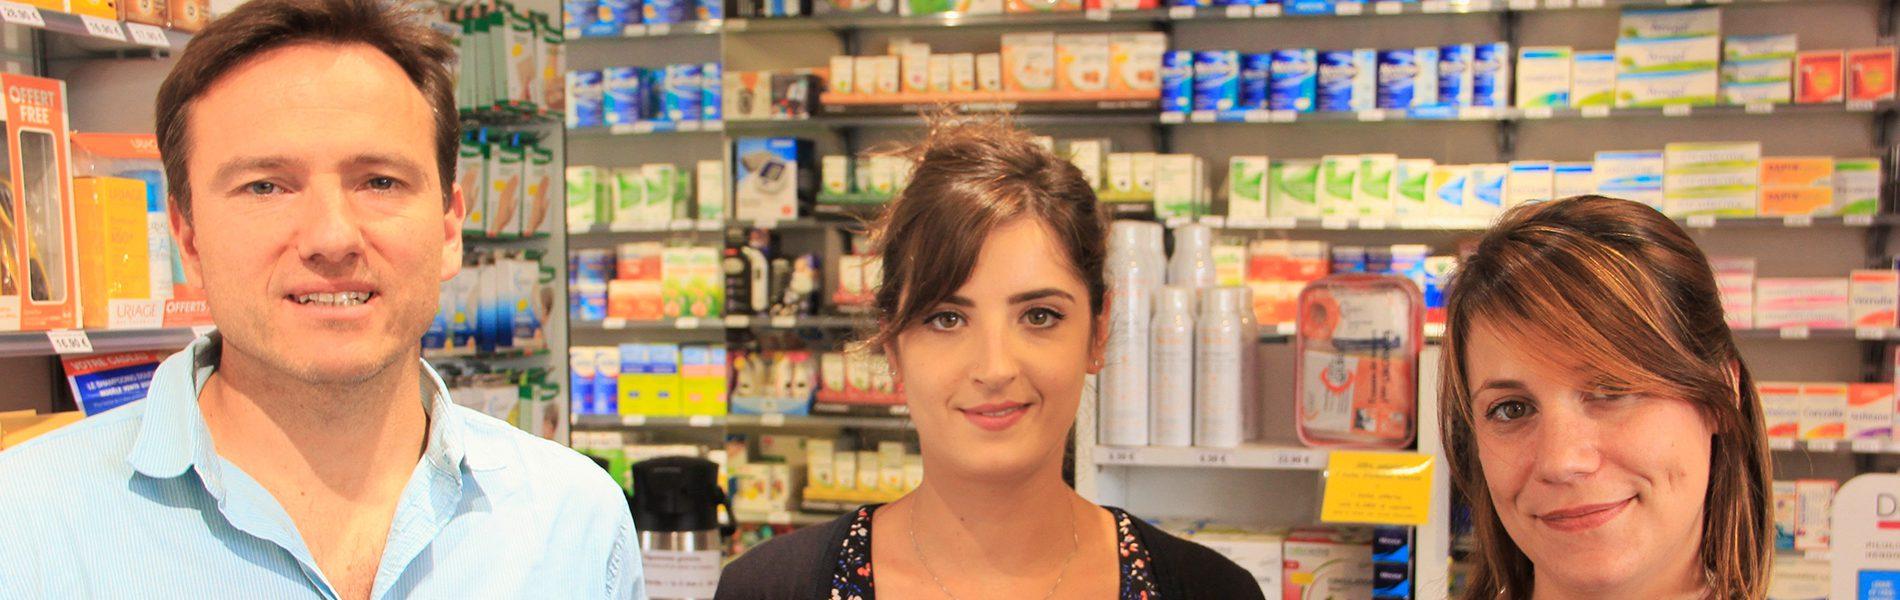 Pharmacie DES ARCADES - Image Homepage 4